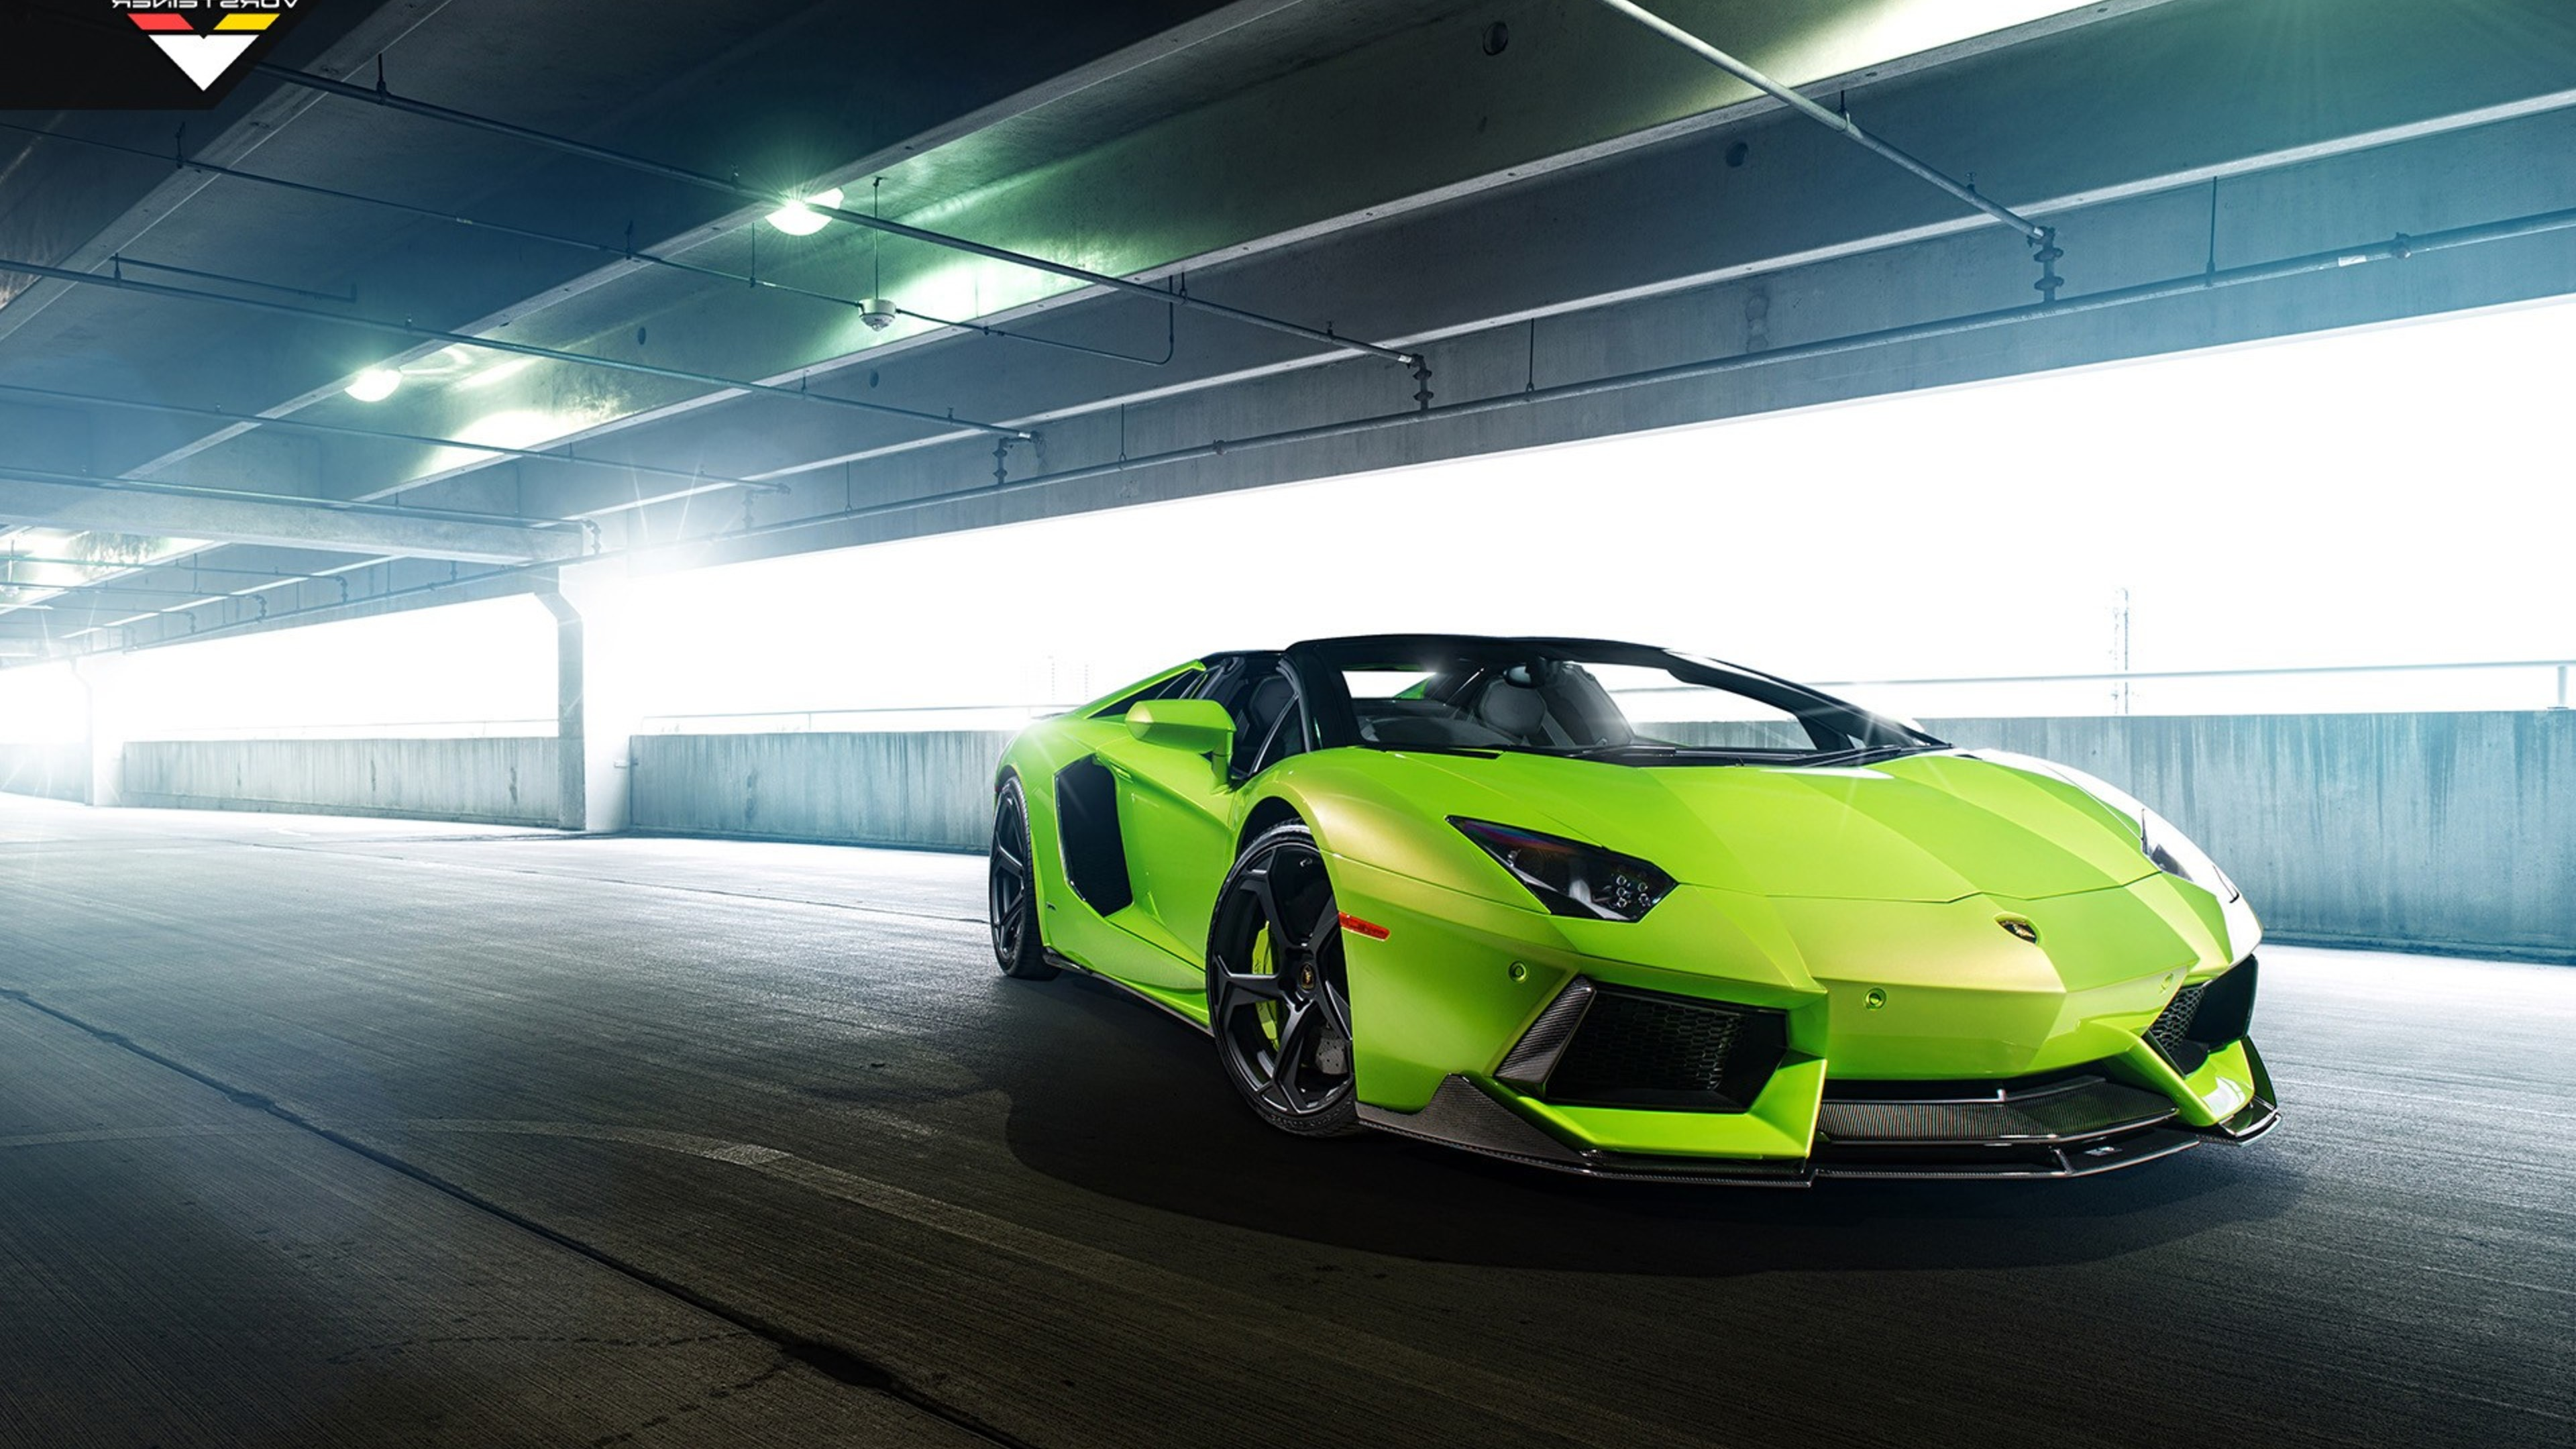 Wallpapers Green And Lamborghini On Pinterest: Lamborghini Green, HD Cars, 4k Wallpapers, Images